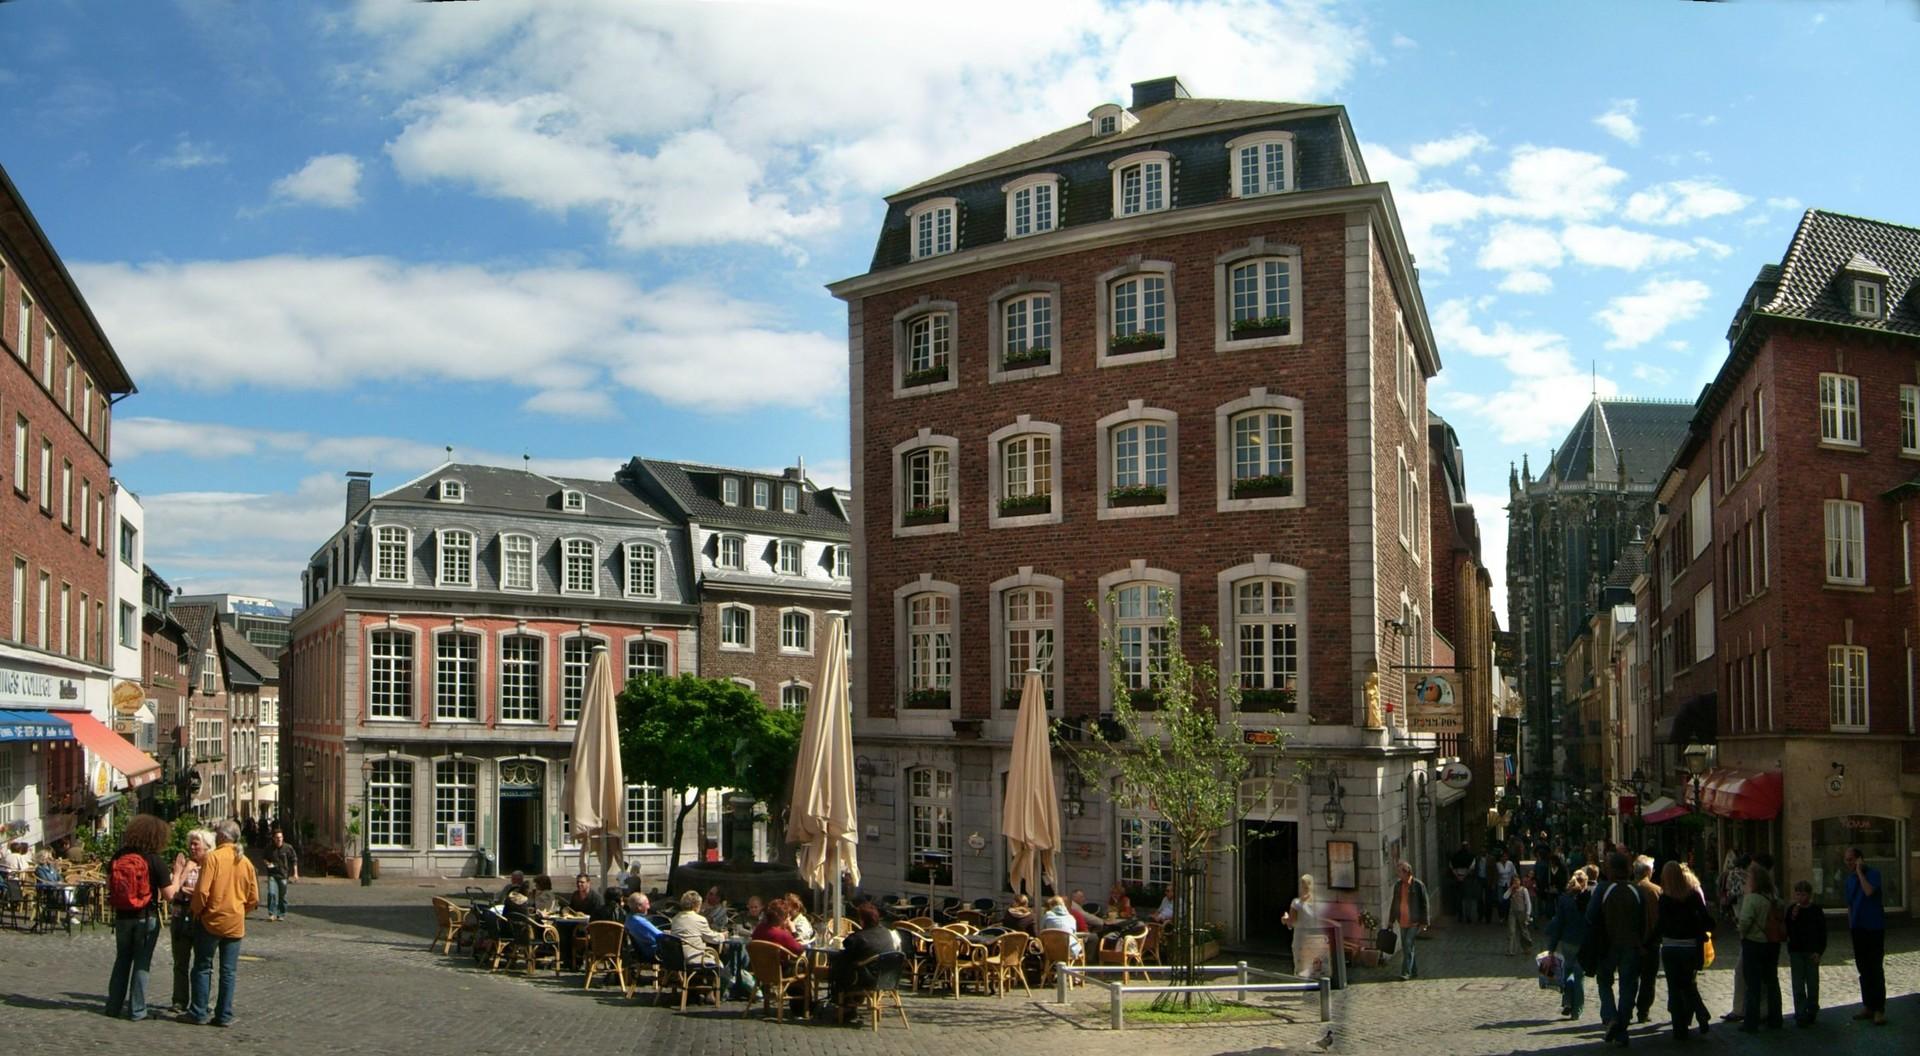 Experiência de Erasmus em Aachen, Alemanha, por Alberto